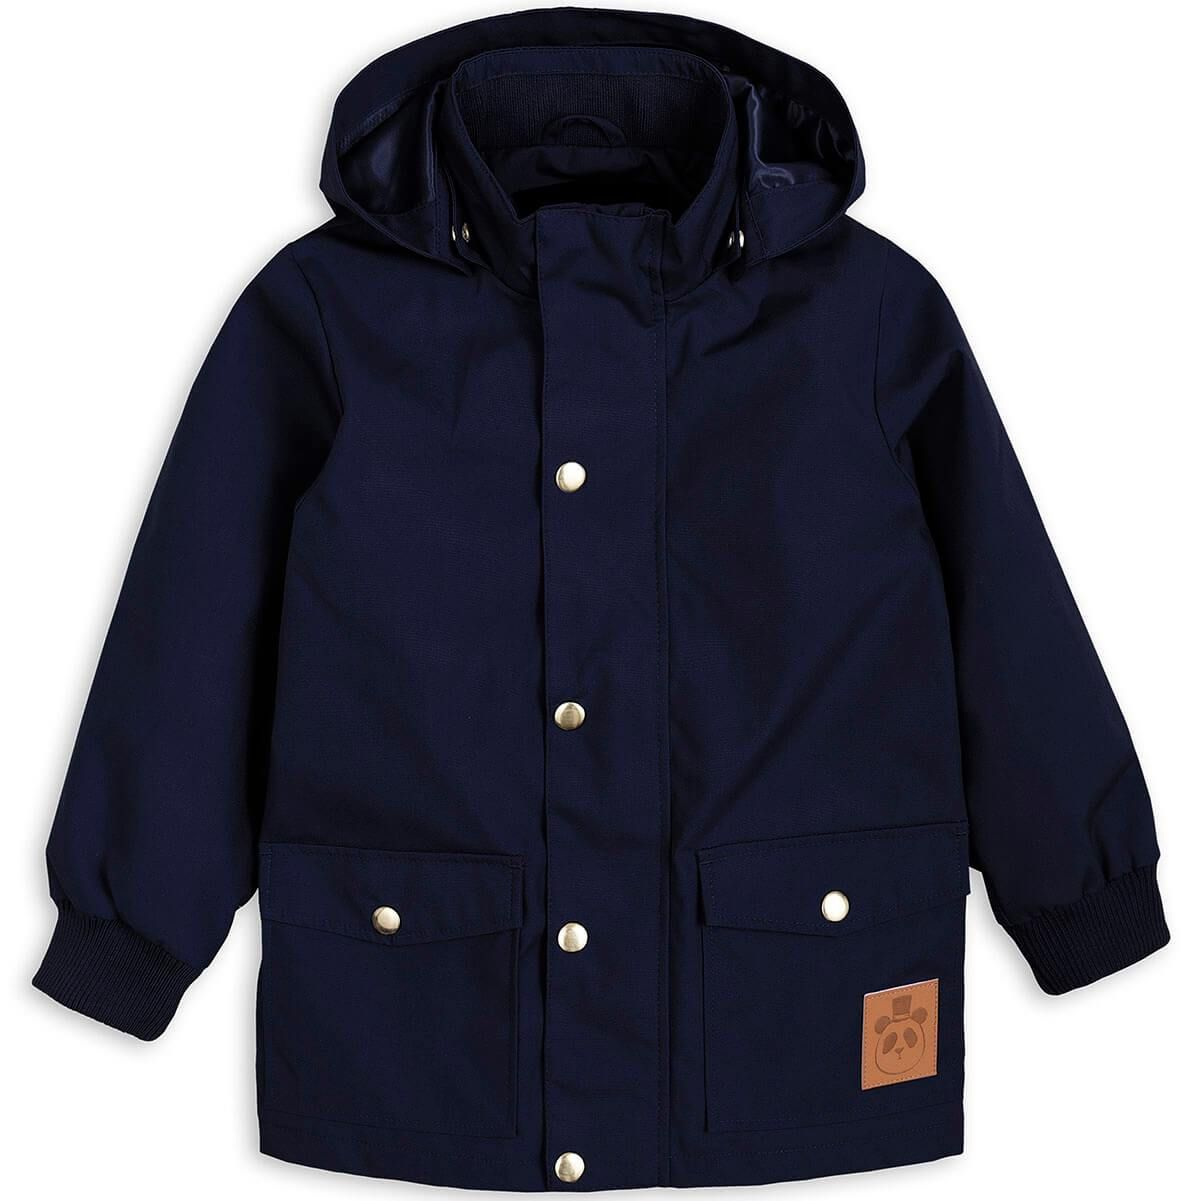 363a0fcb74d9 Pico Jacket in Navy by Mini Rodini – Junior Edition